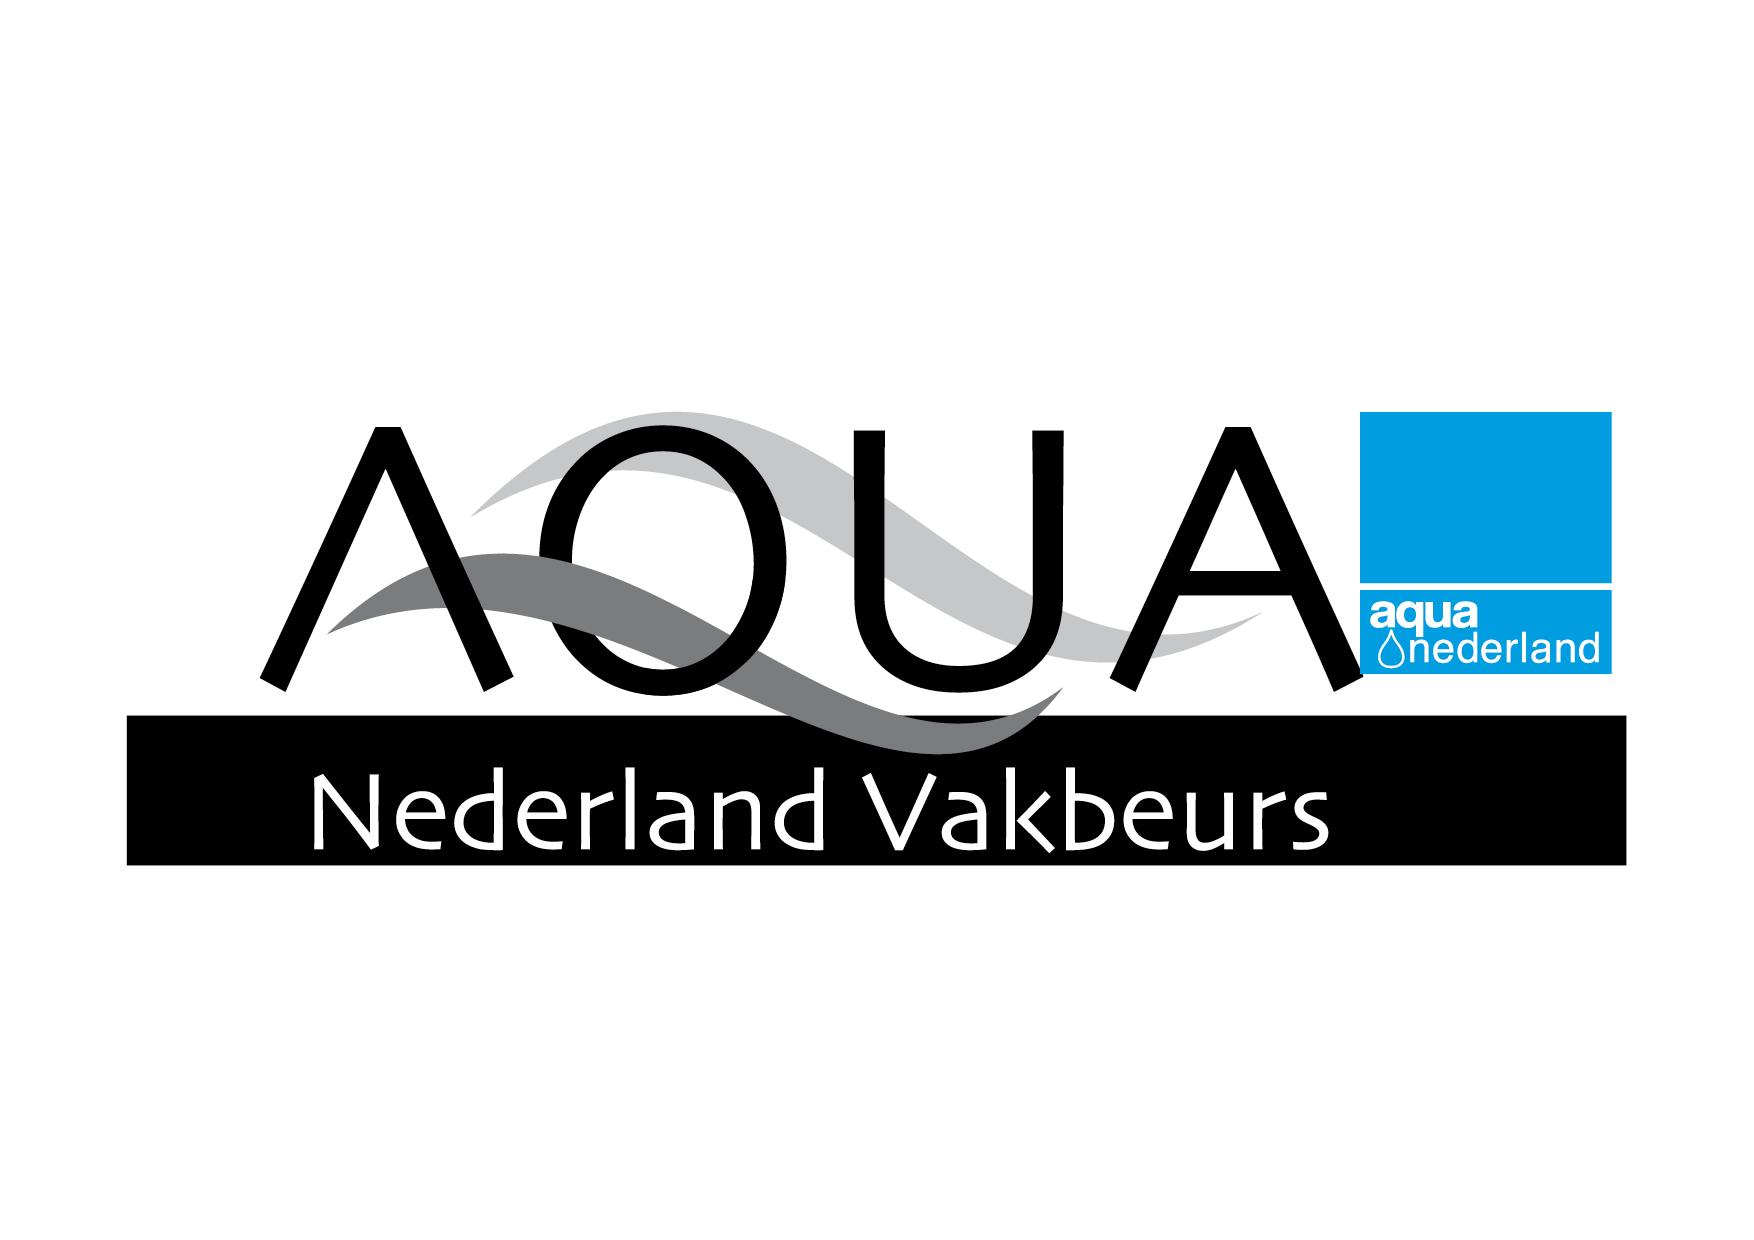 aqua nederland vakbeurs heartfil